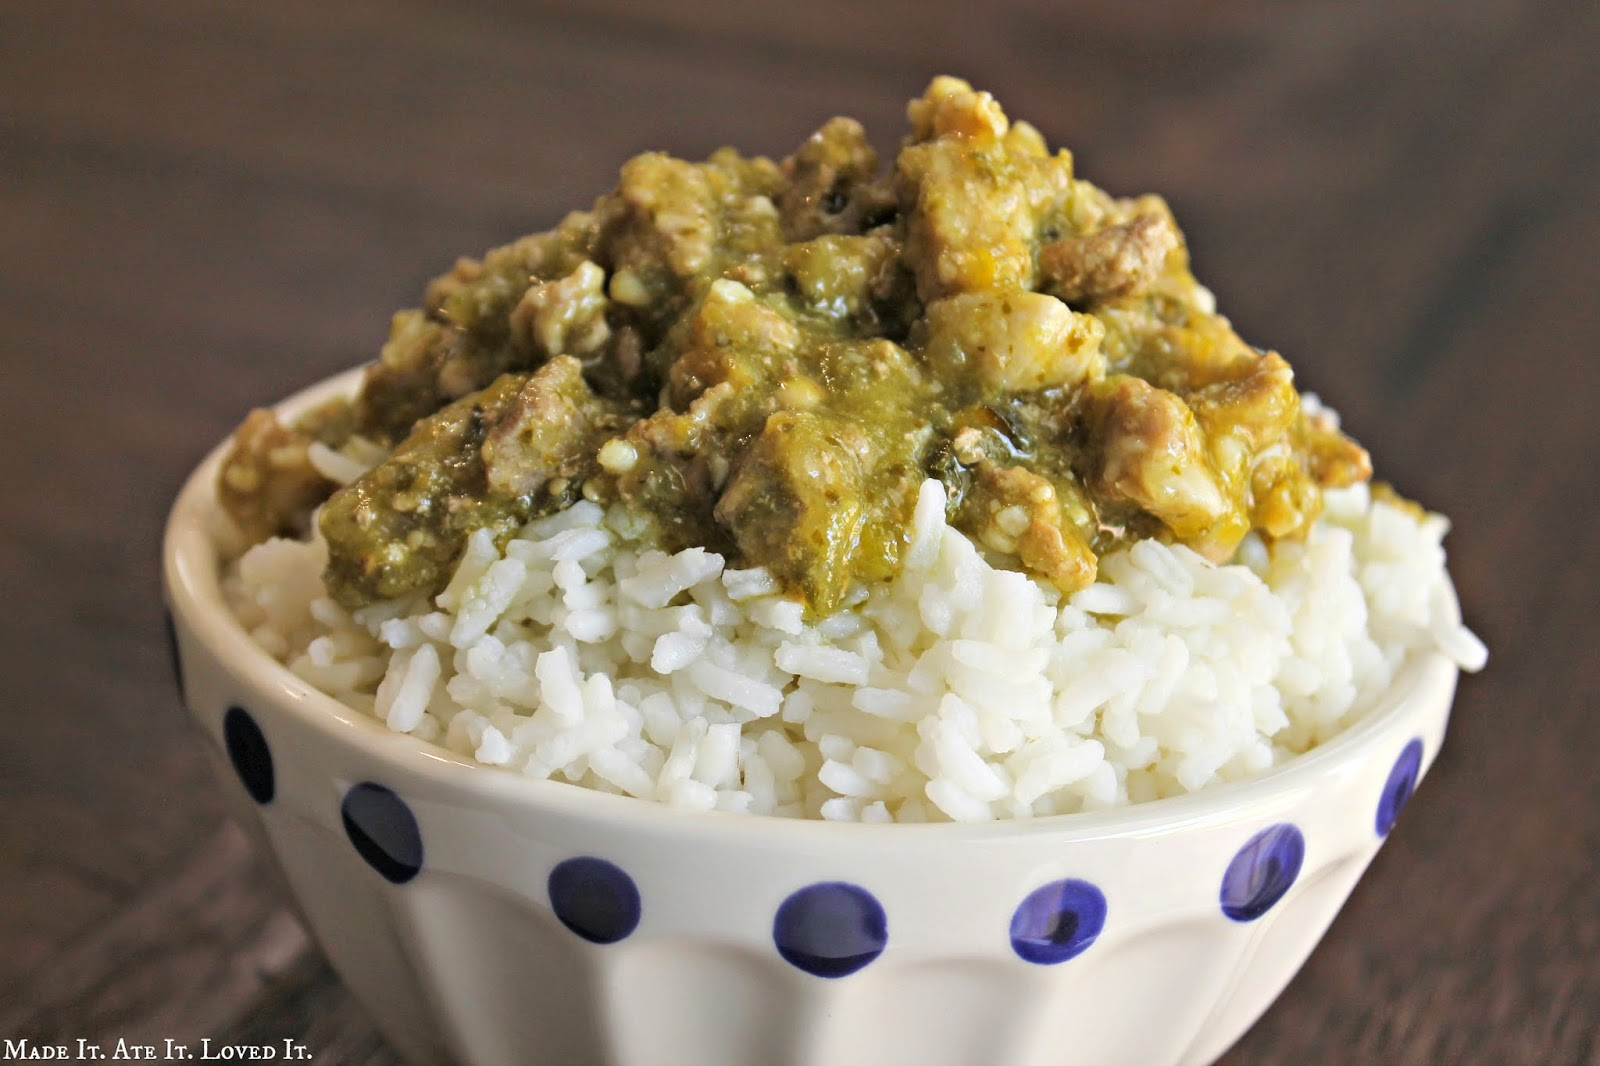 Pork Chili Verde and my favorite Rice